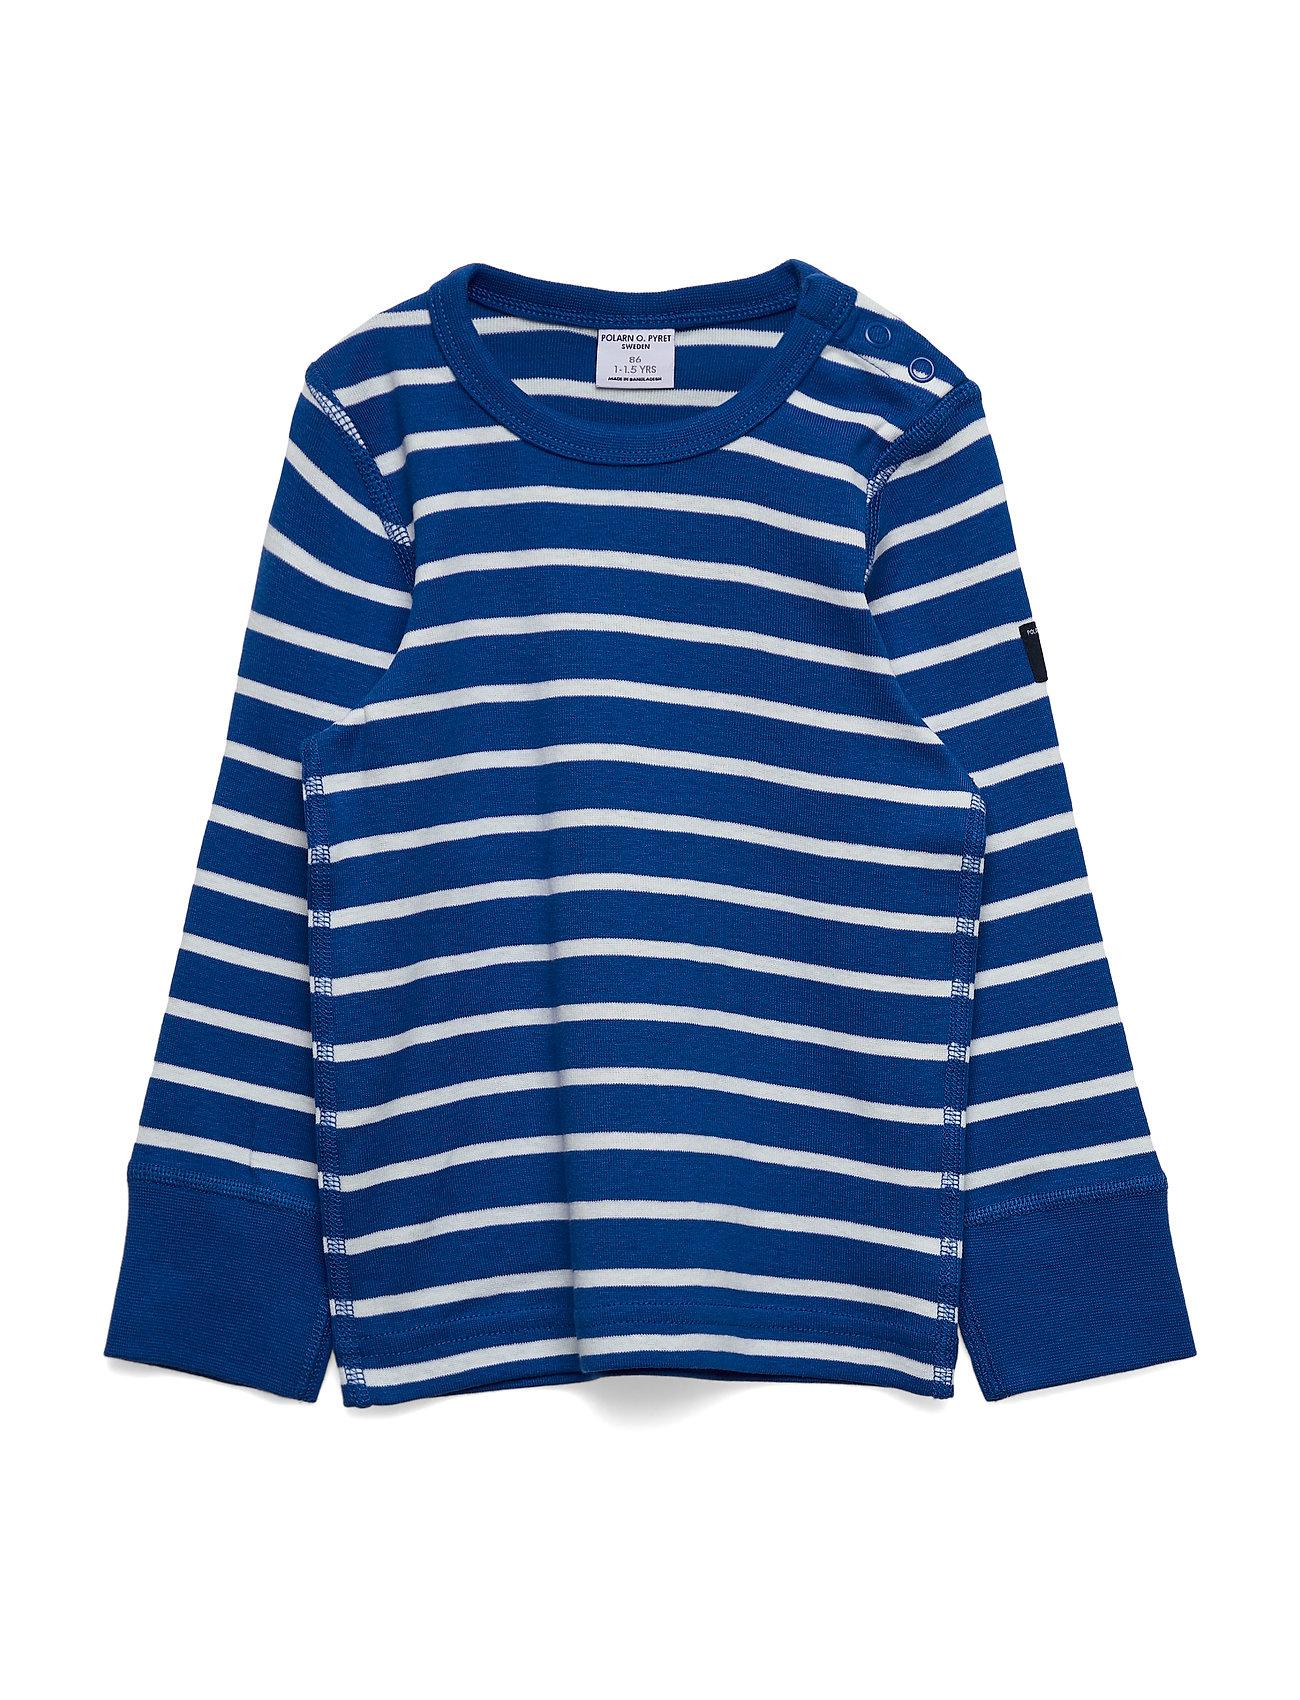 Polarn O. Pyret T-shirt L/S Stripe Preschool - PRINCESS BLUE